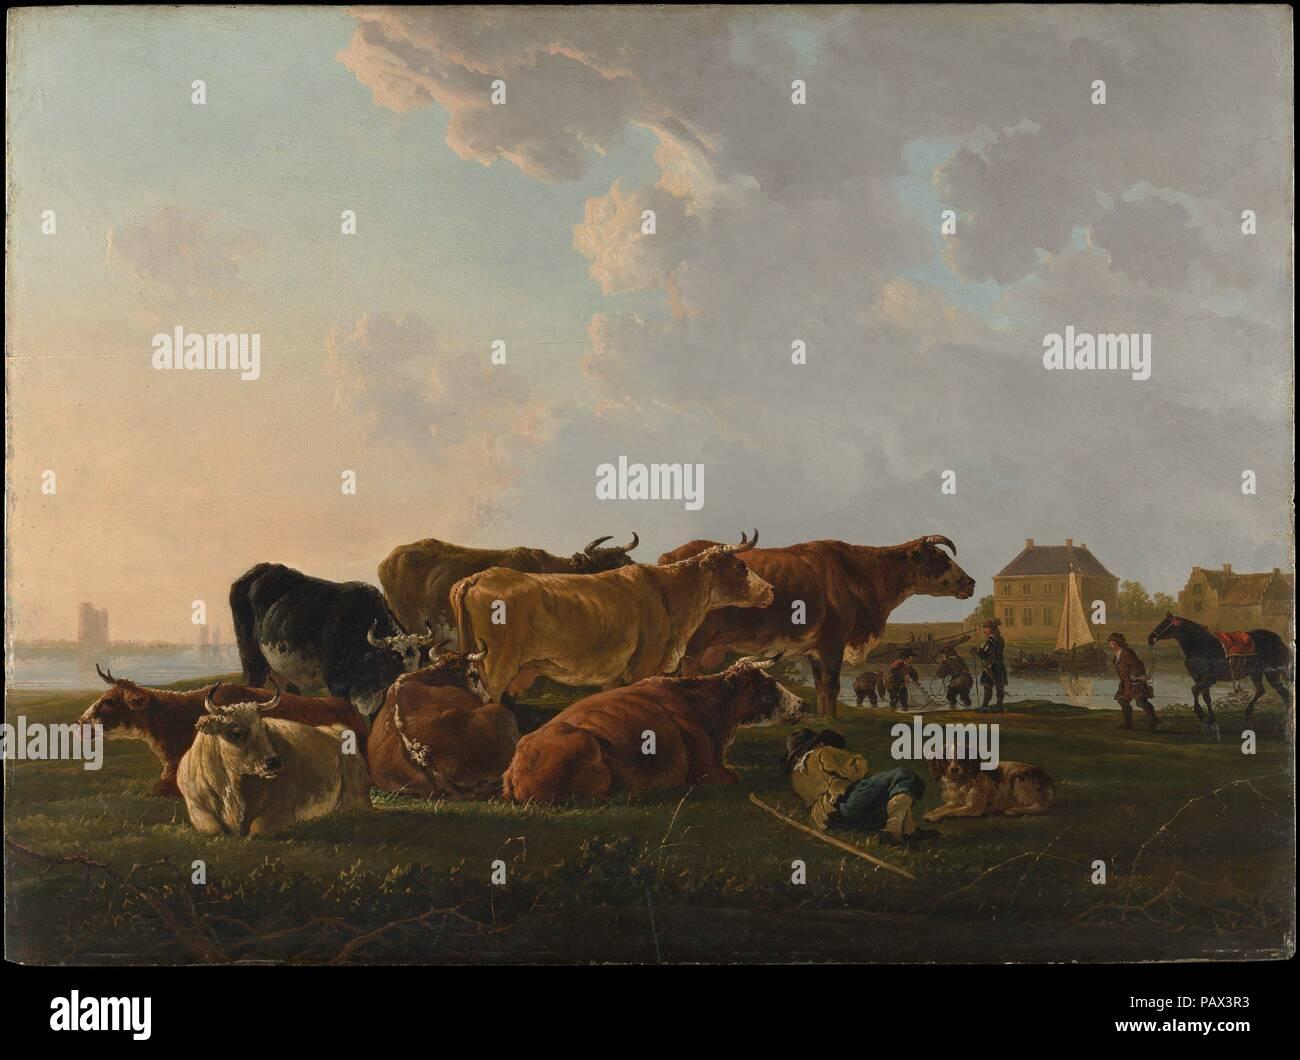 Landscape with Cattle  Artist: Jacob van Strij (Dutch, Dordrecht